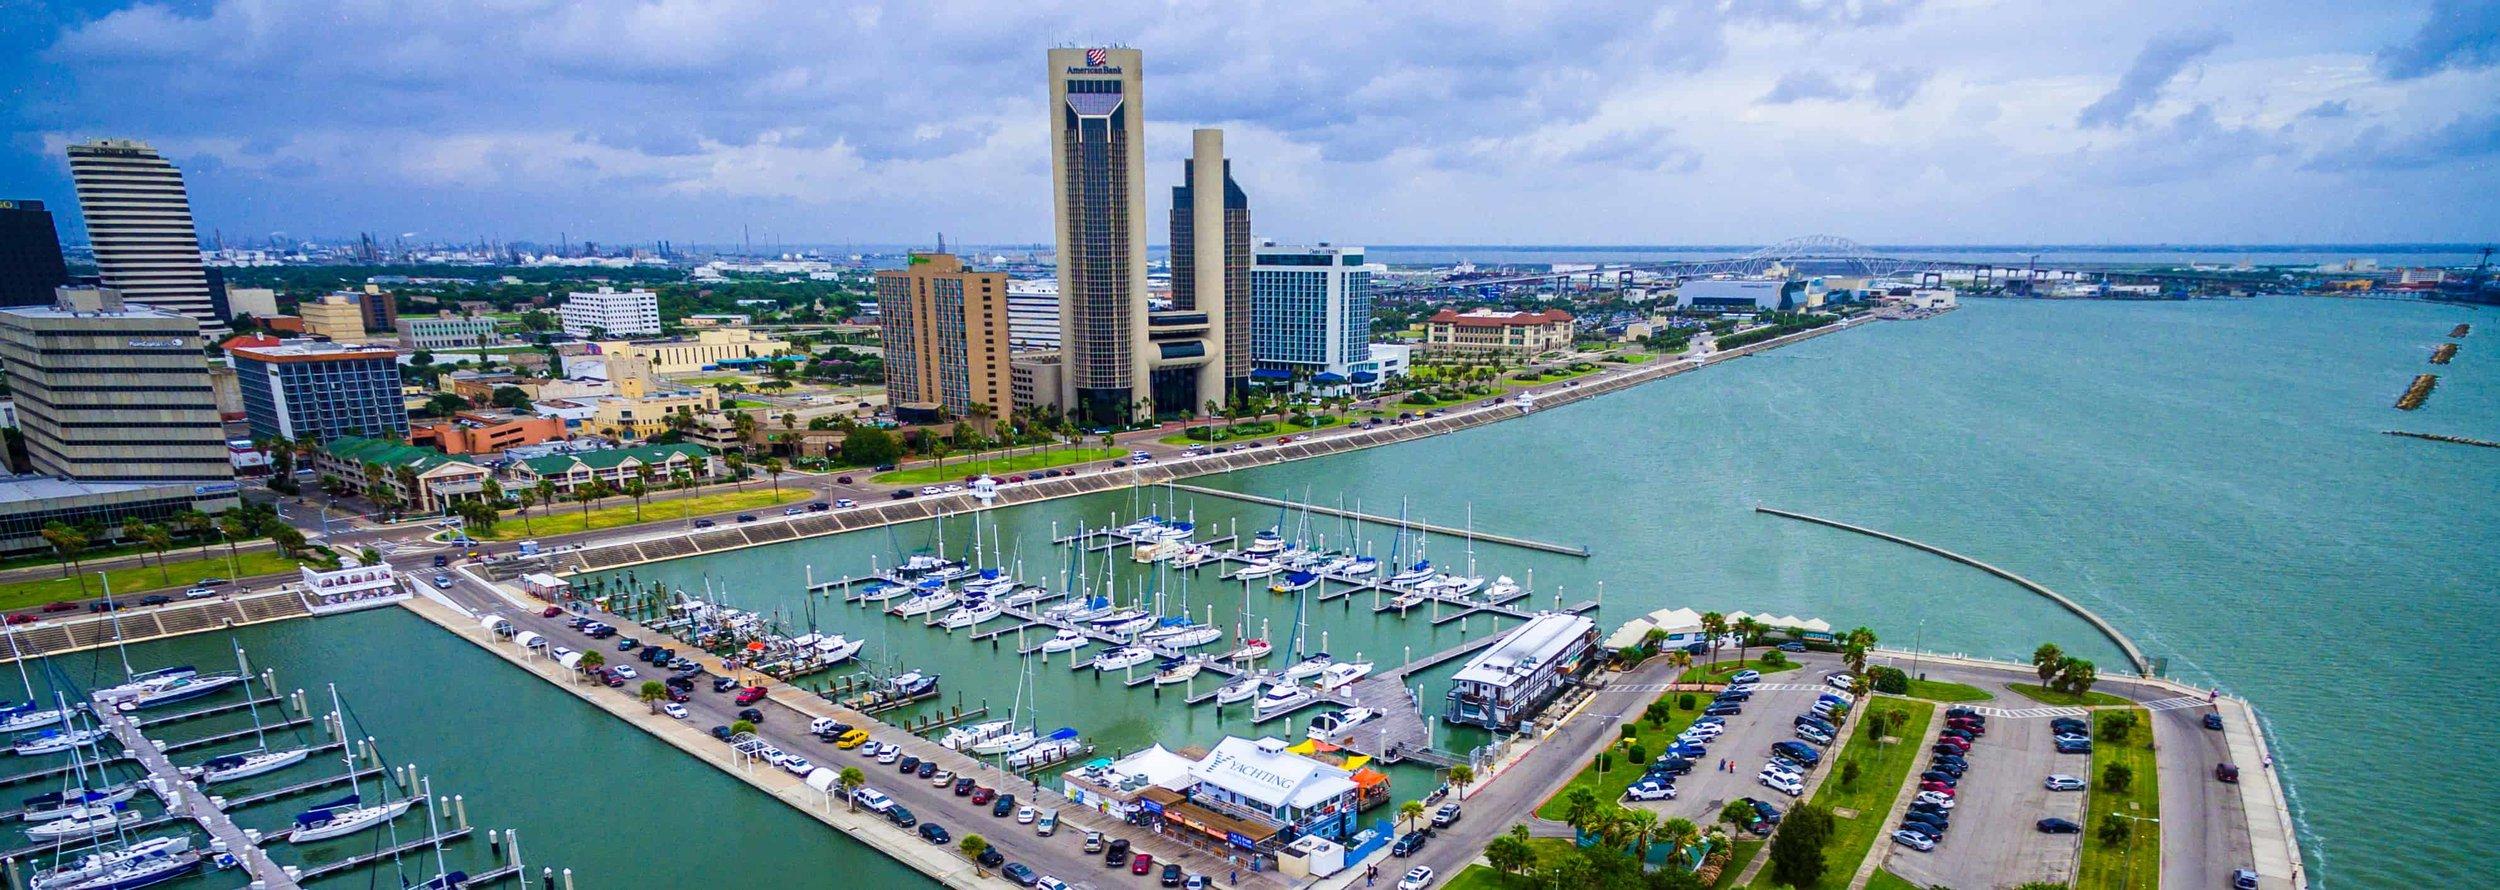 Sell Land in Corpus Christi TX Fast